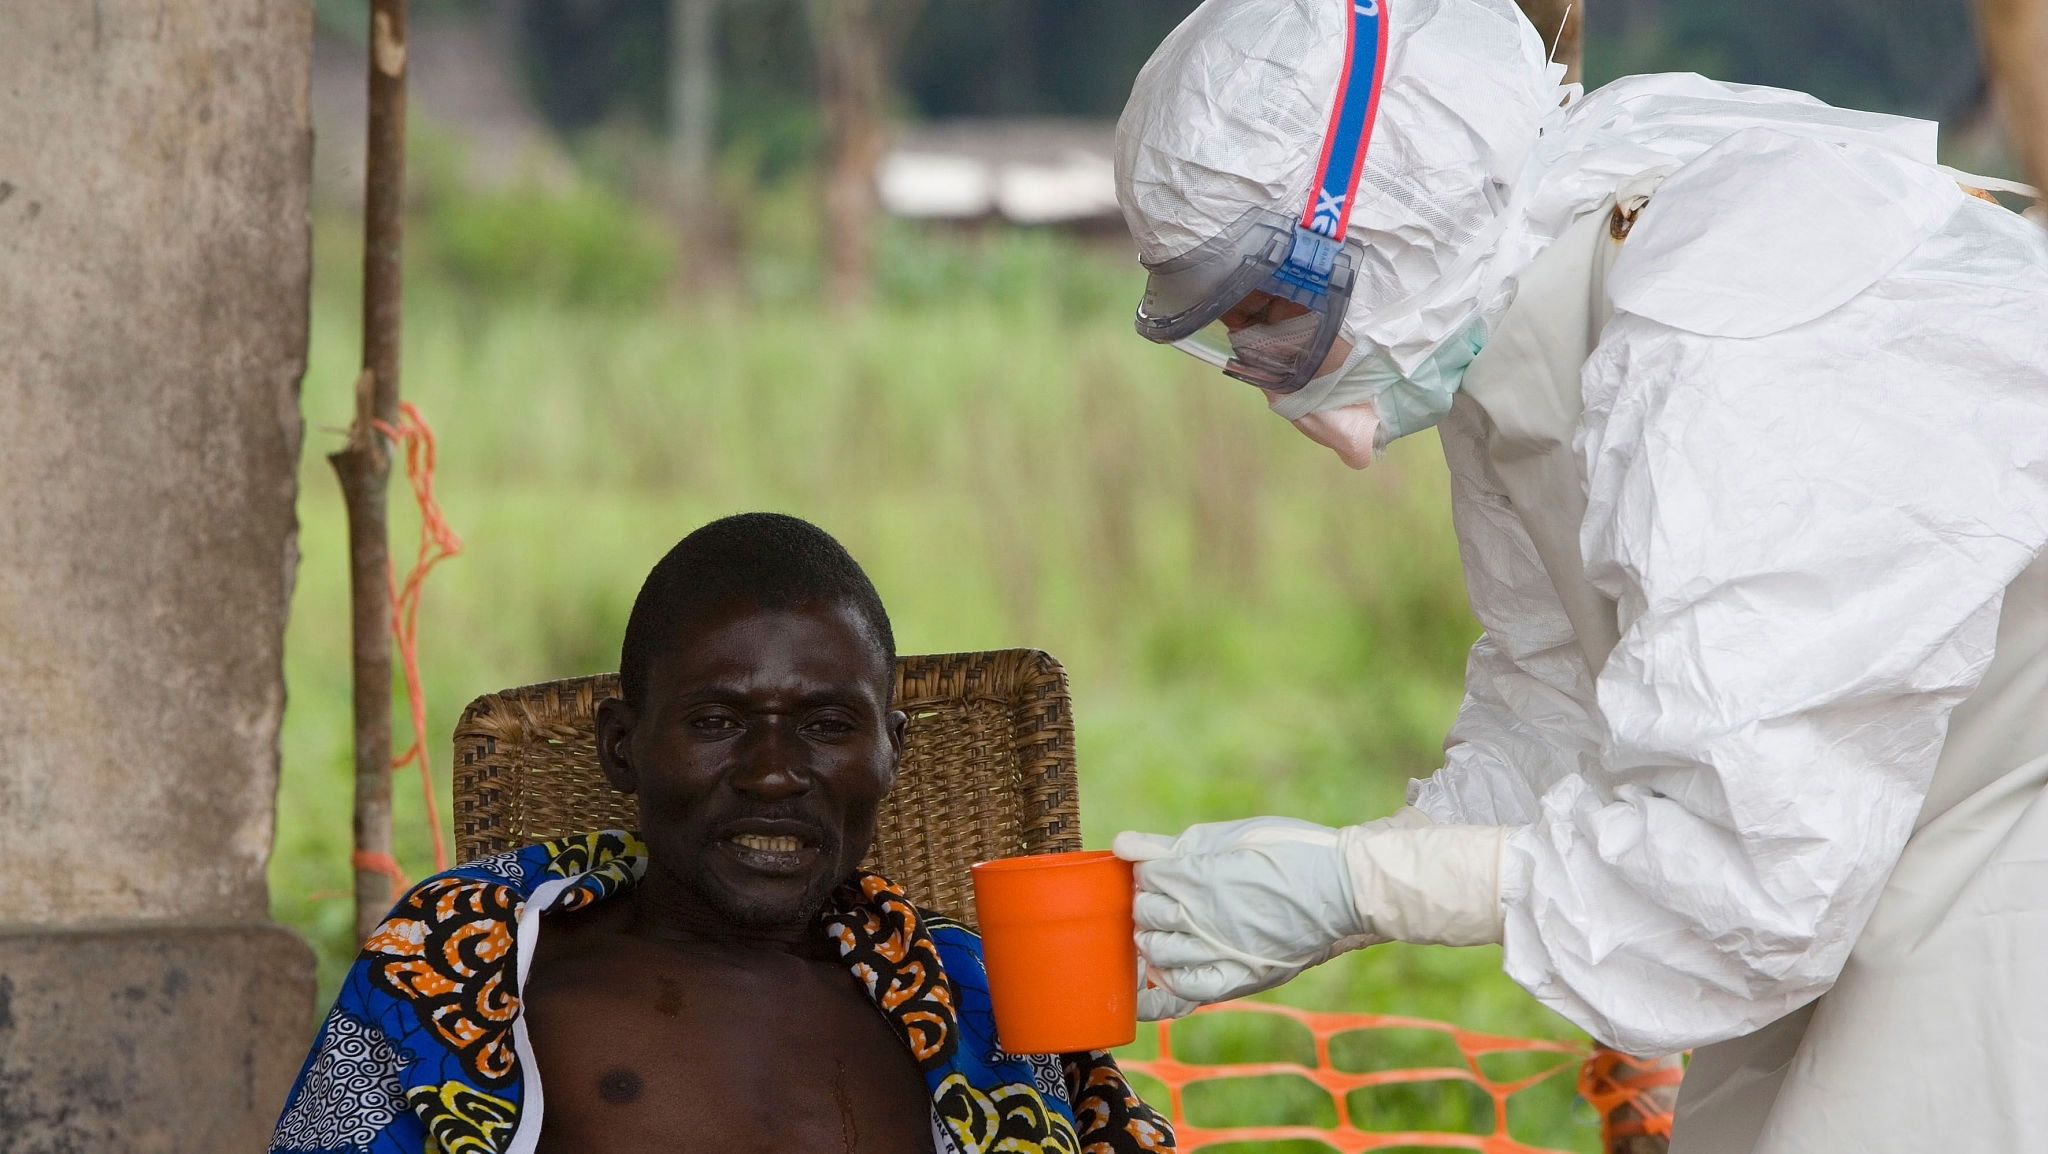 Ebola spreading into 'high security risk area' of DRC: UN